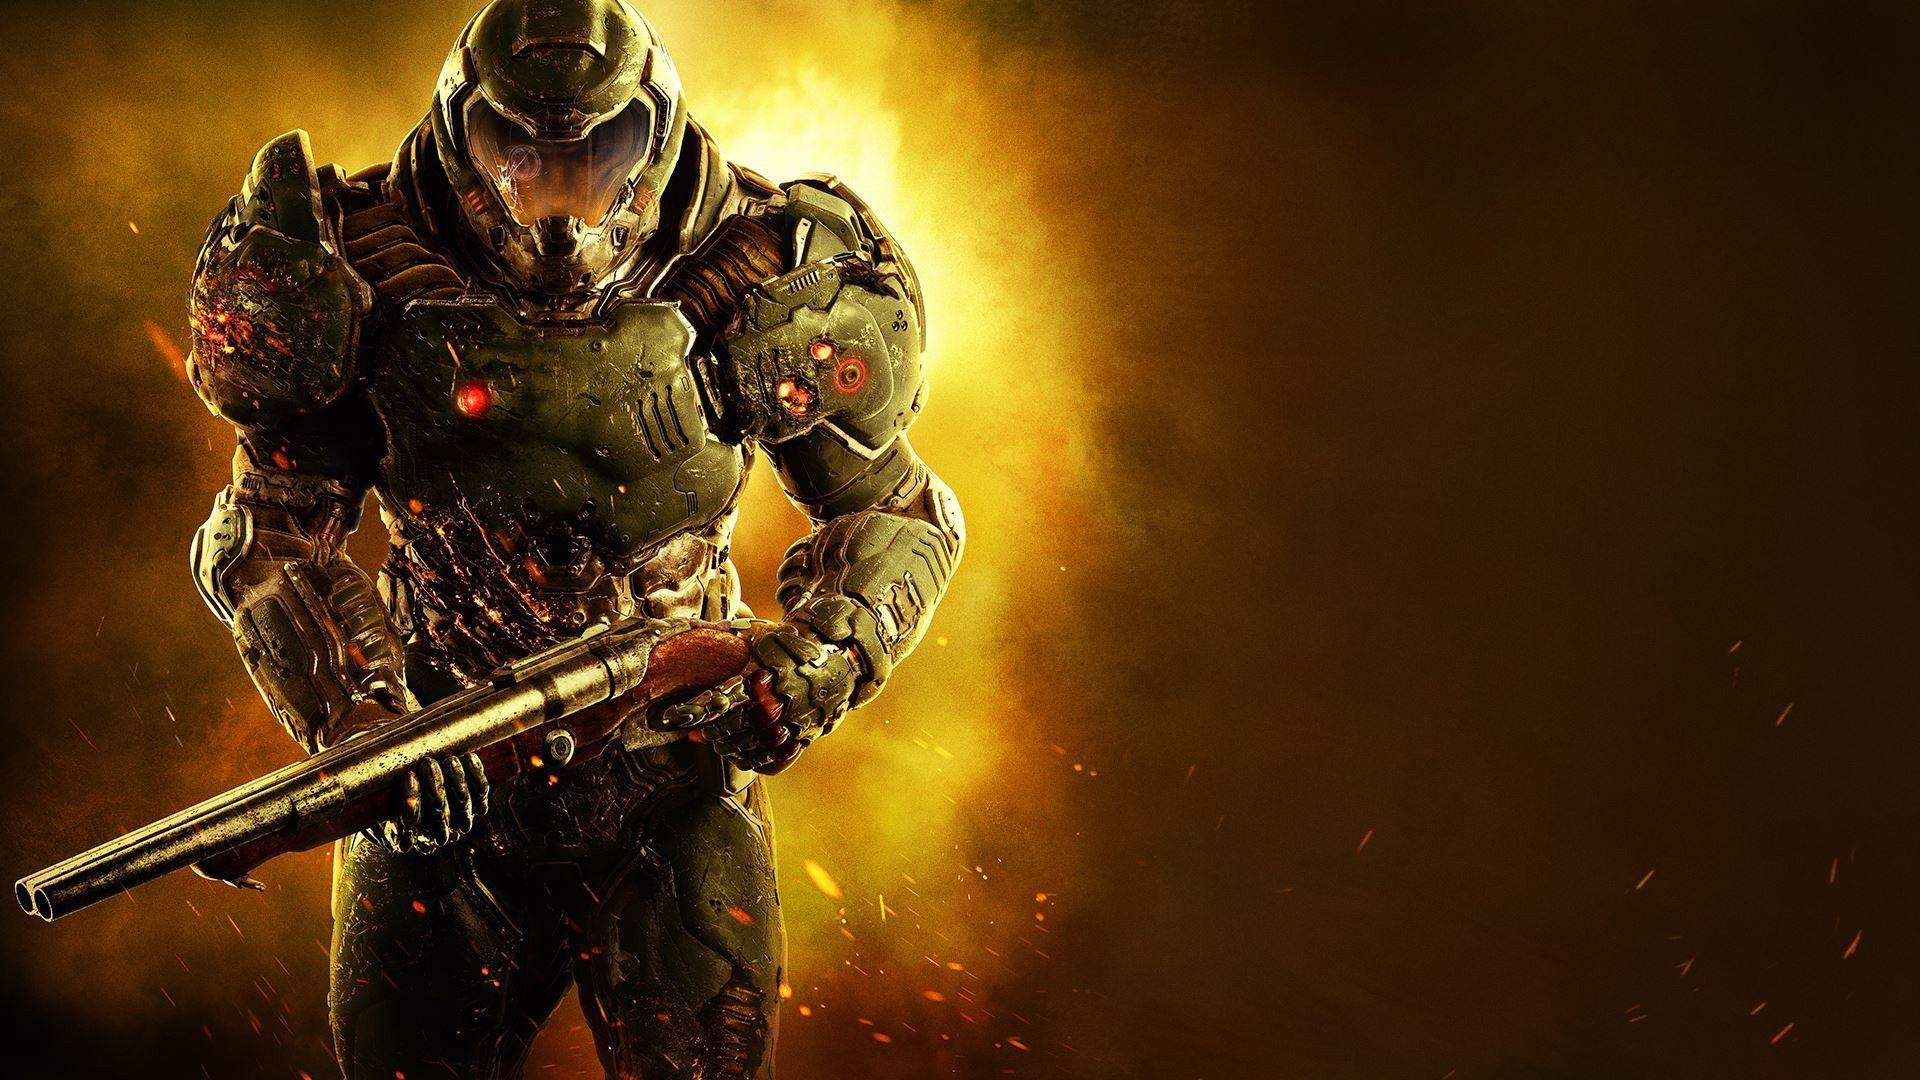 Doom Wallpaper Videojuegos Xbox One Y Gamers